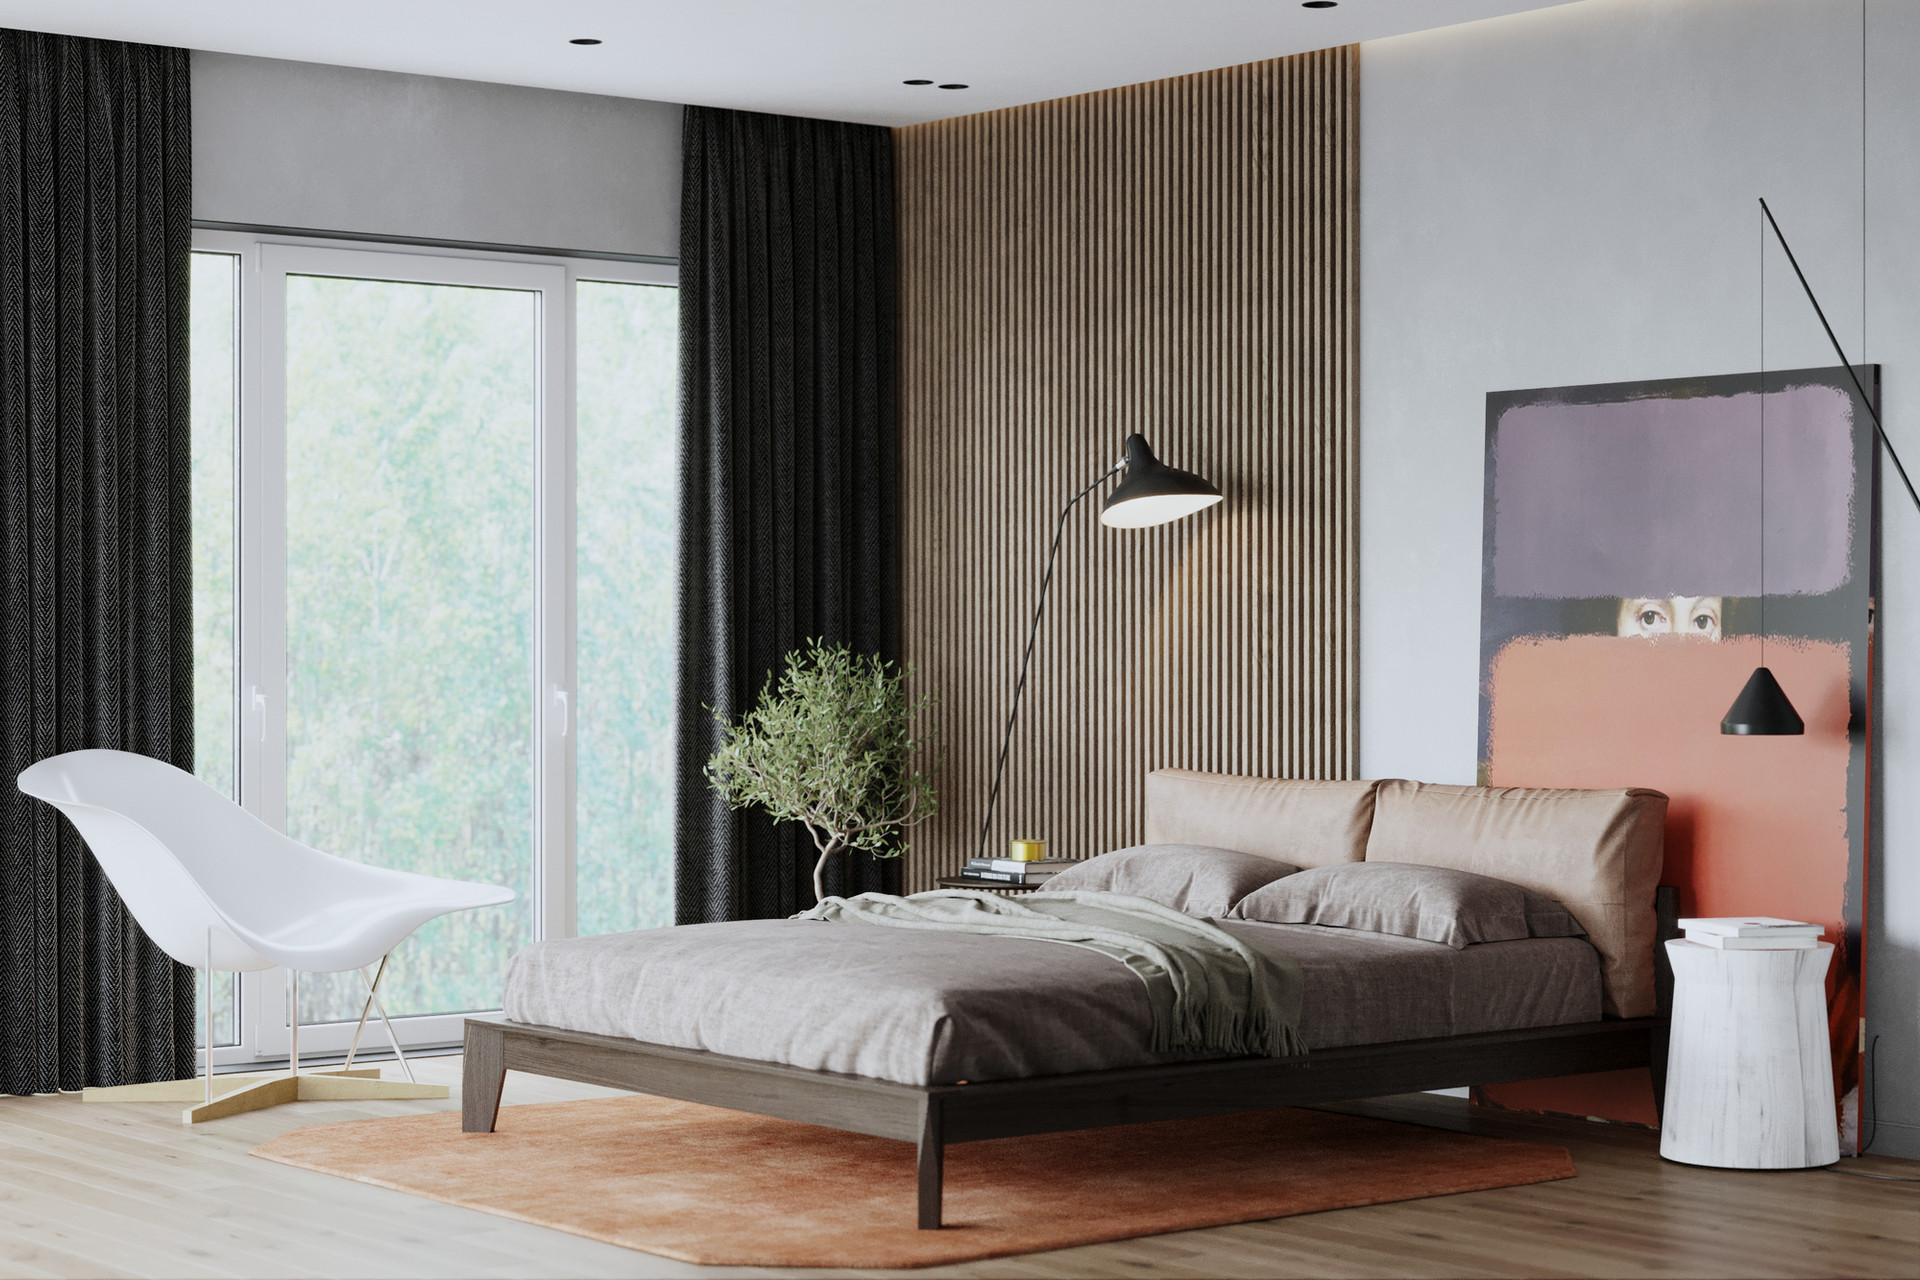 design interior SHUBOCHKINI architects SIA дизайн интерьераpg